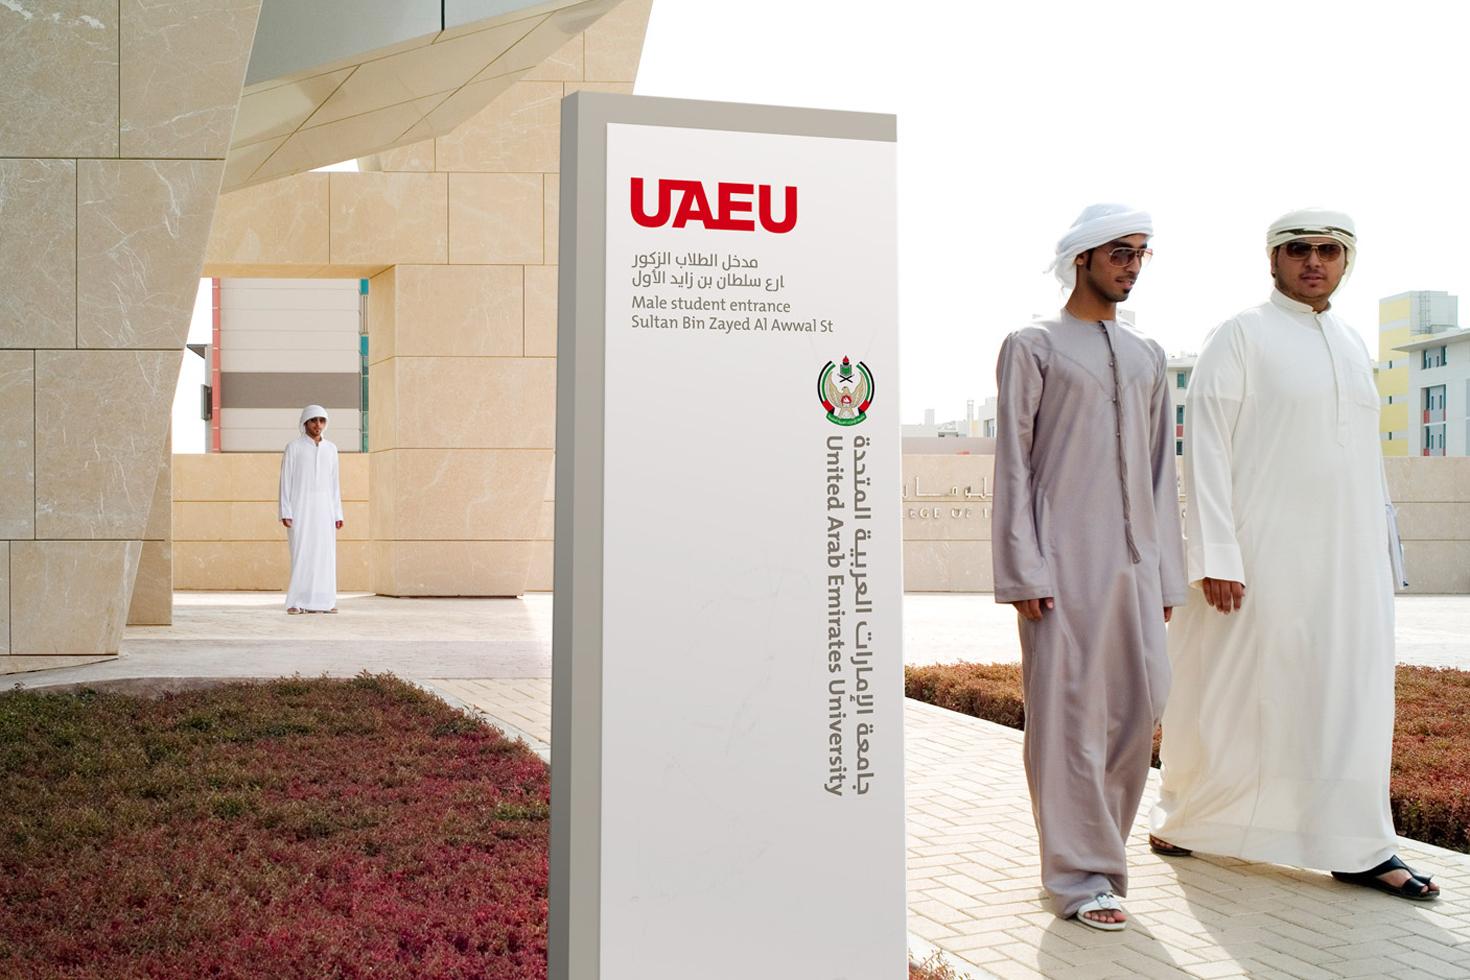 UAEU signage